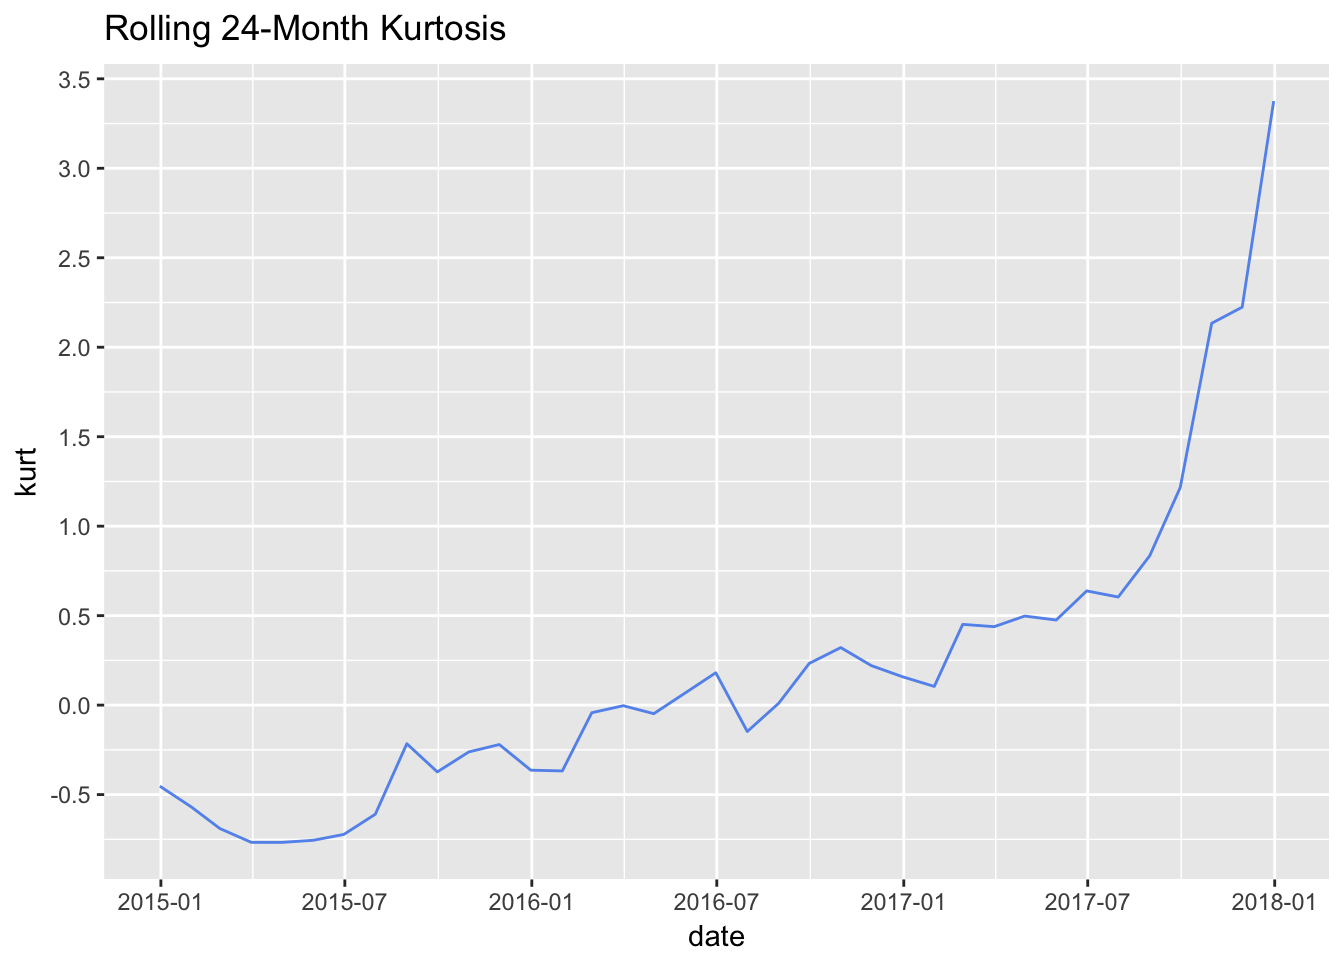 Rolling Kurtosis ggplot